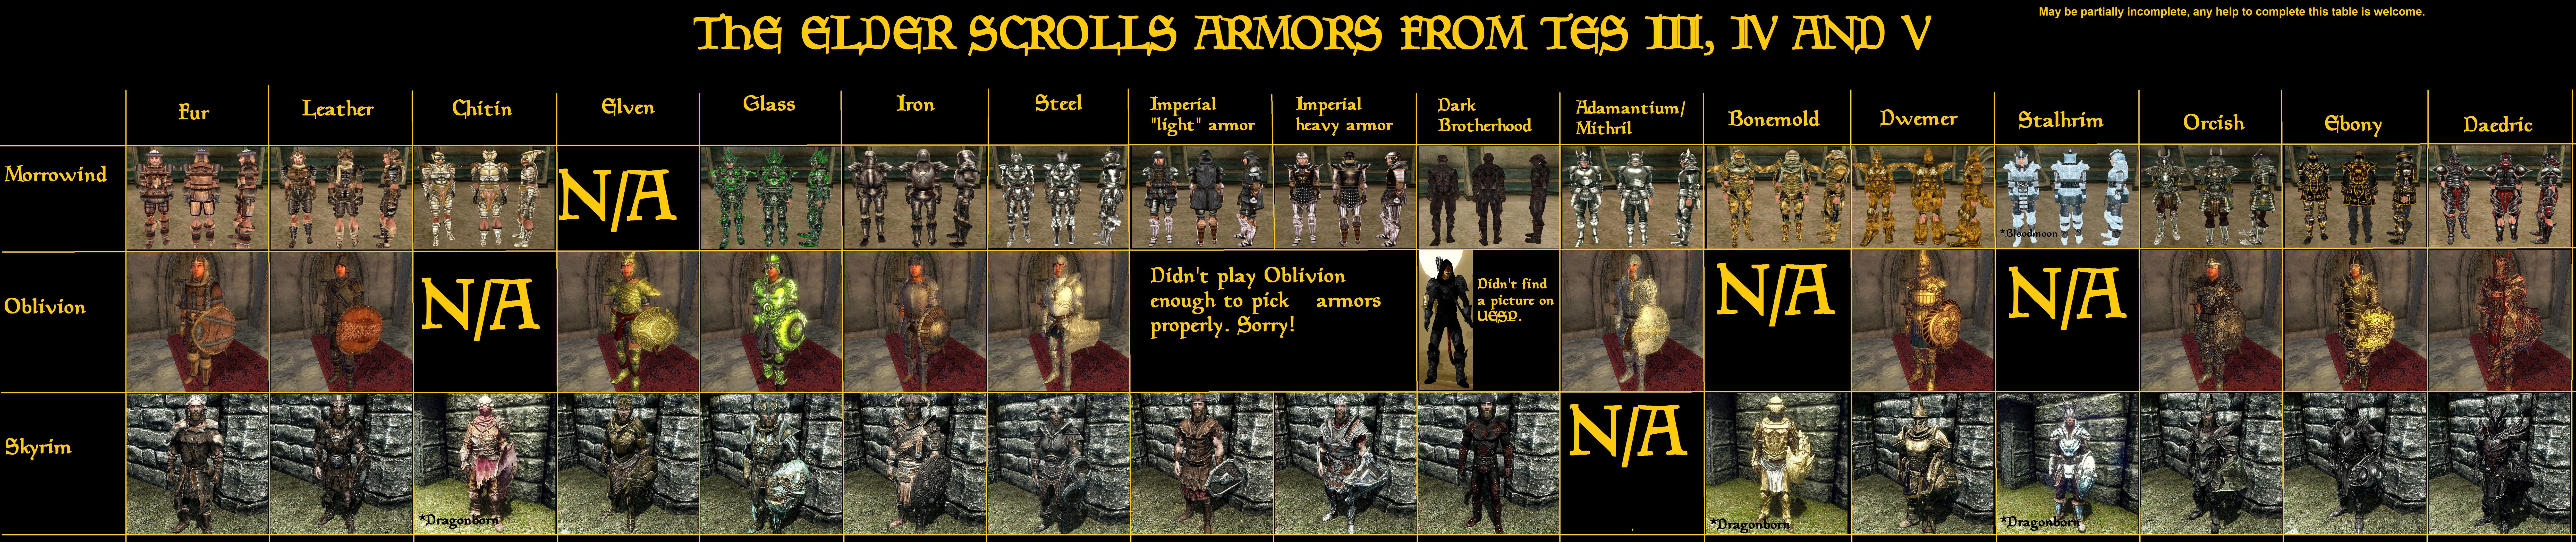 1373920670-tes-3-4-5-armors.jpg